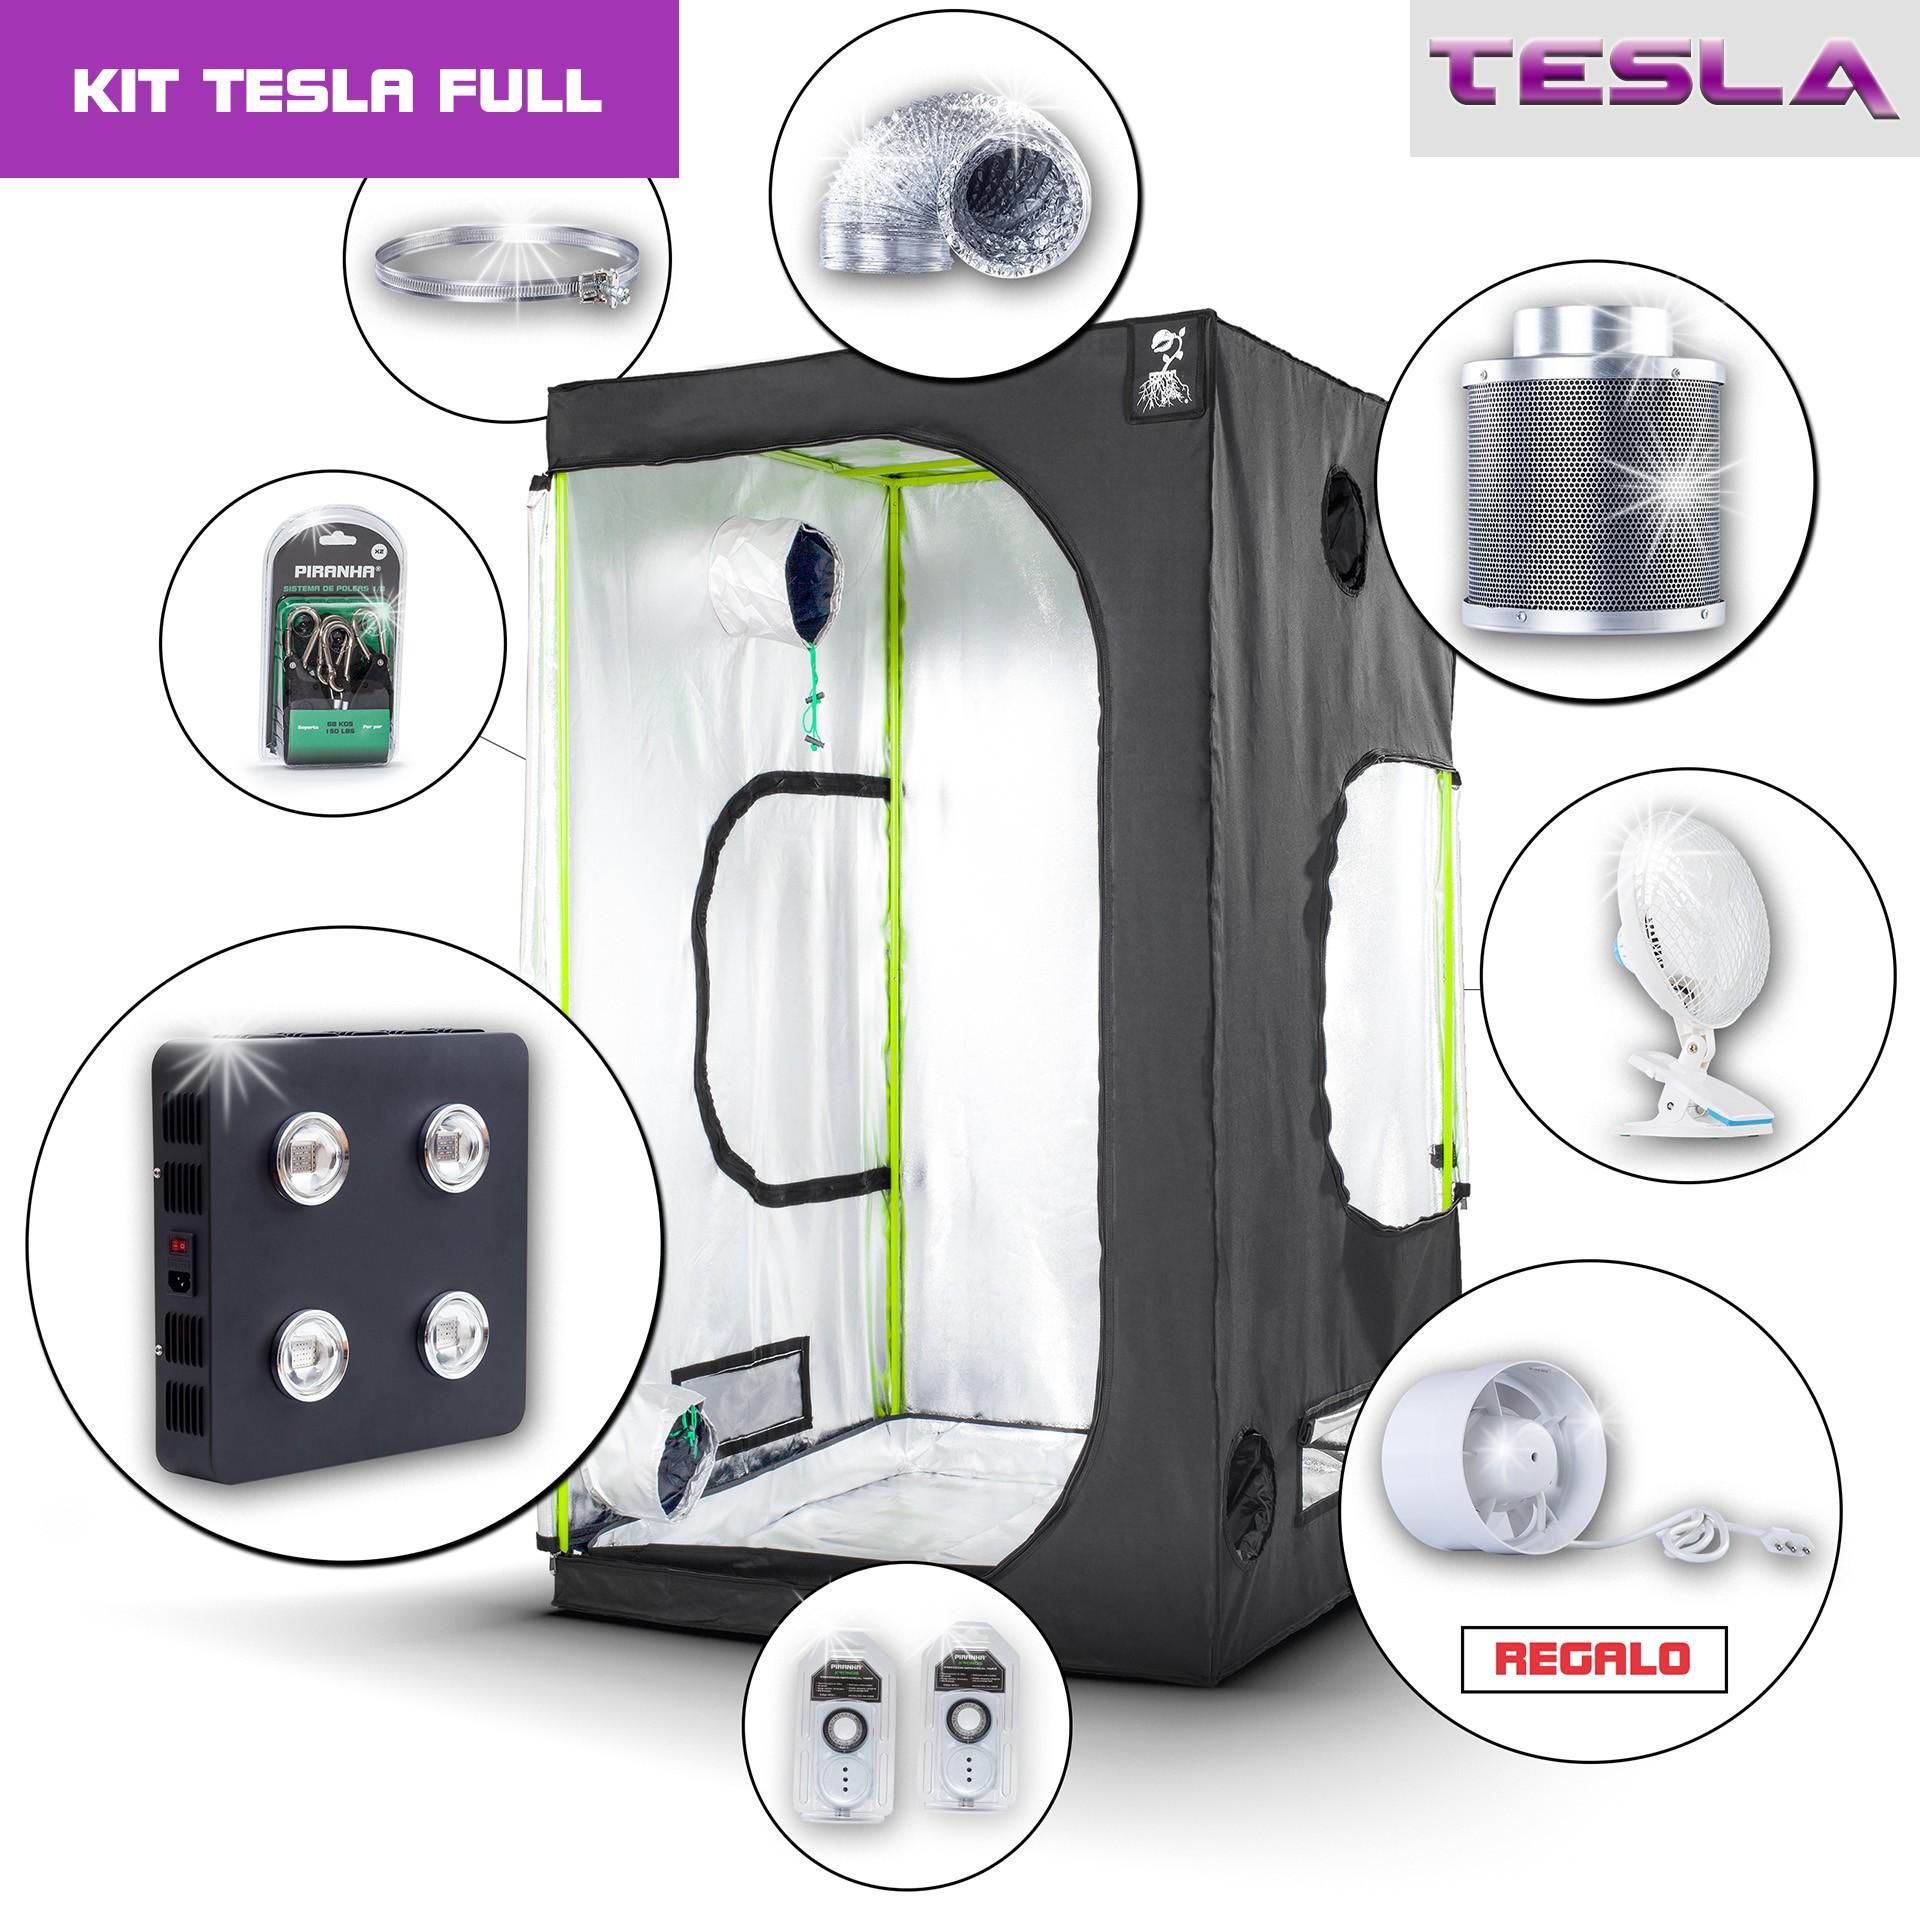 Kit Tesla 120 - T360W Full